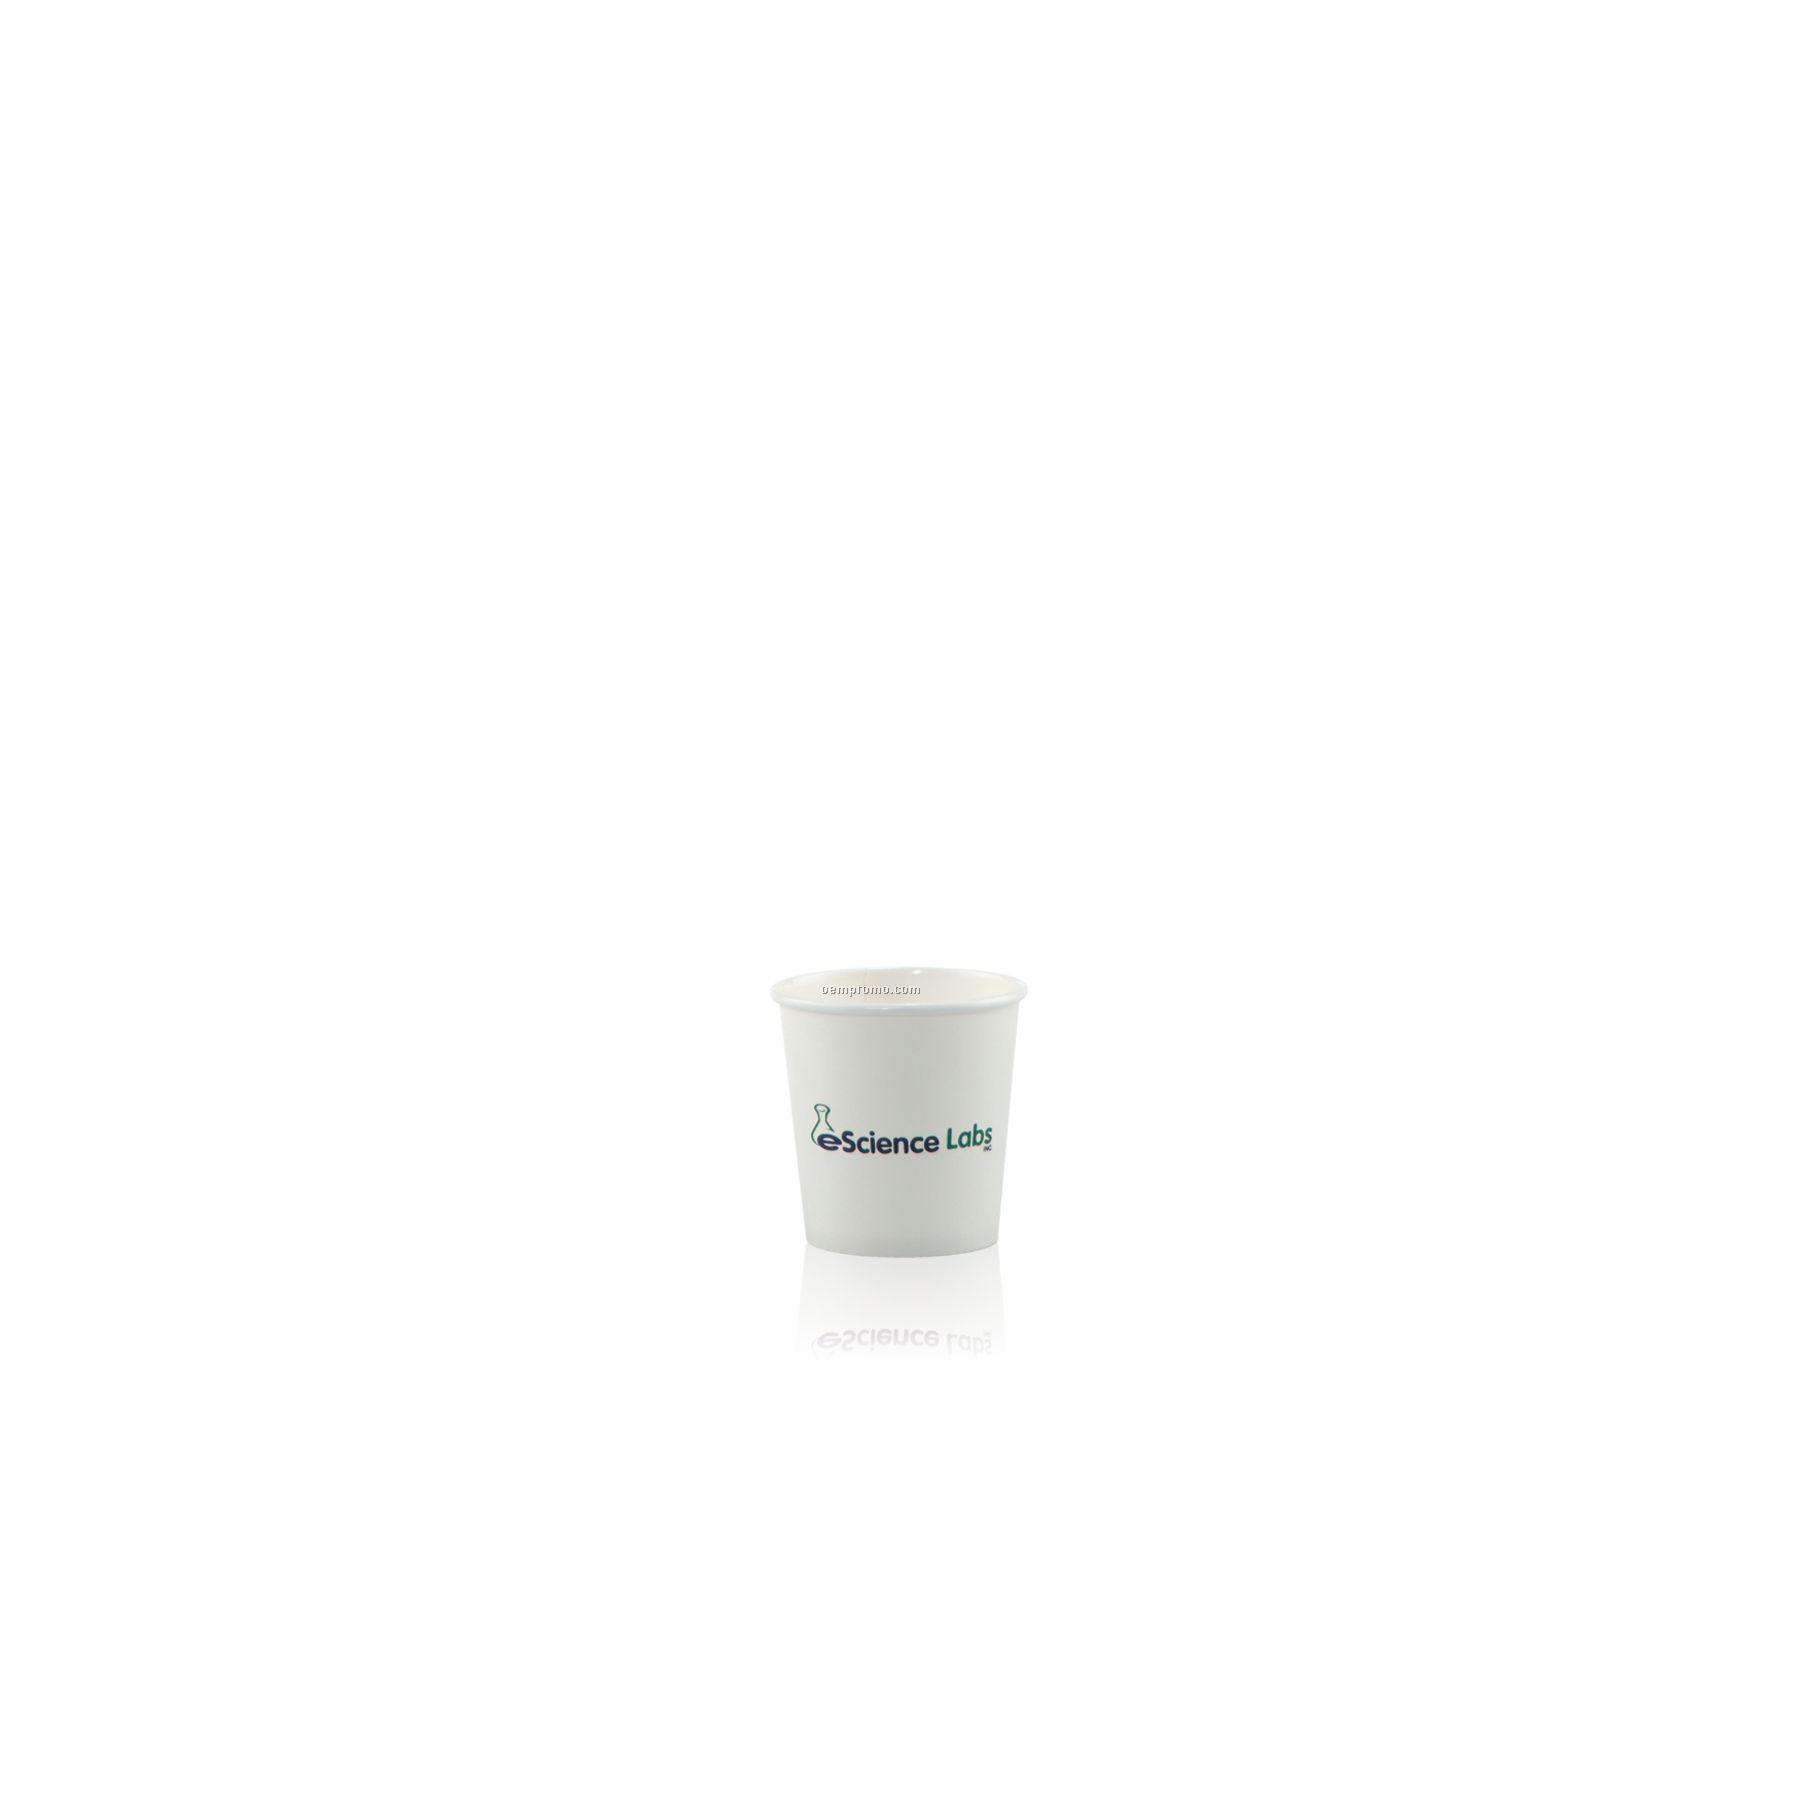 4 Oz. White Paper Cup